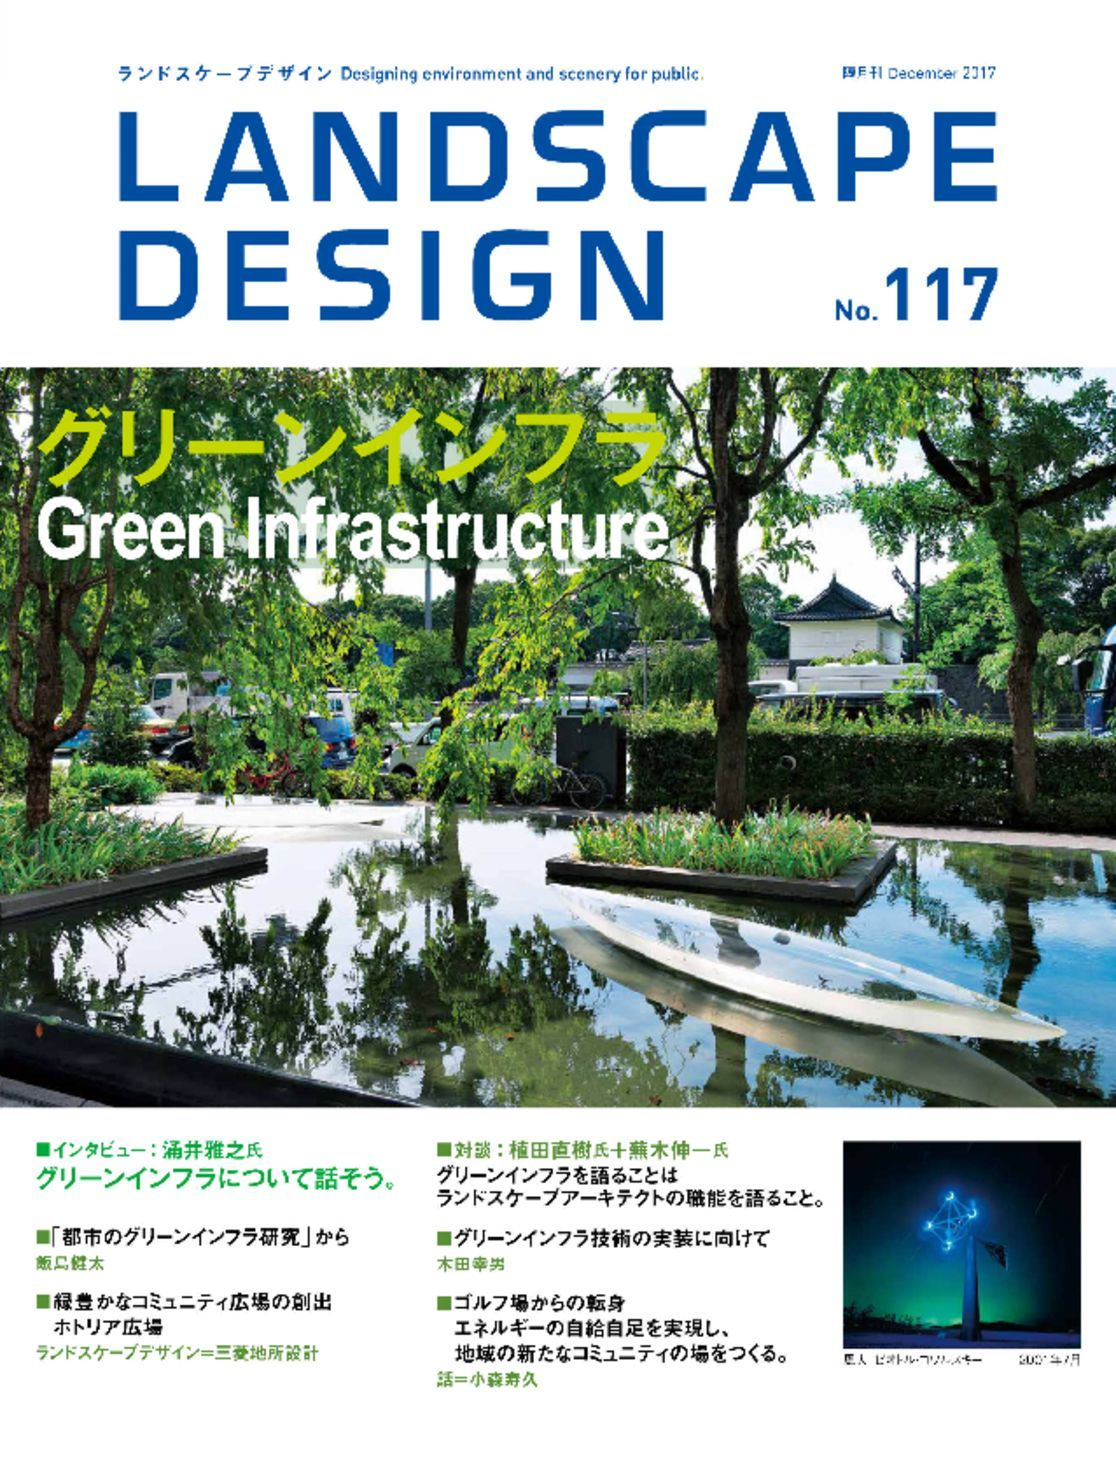 Landscape Design U30e9u30f3u30c9u30b9u30b1u30fcu30d7u30c7u30b6u30a4u30f3 Magazine (Digital) - DiscountMags.com